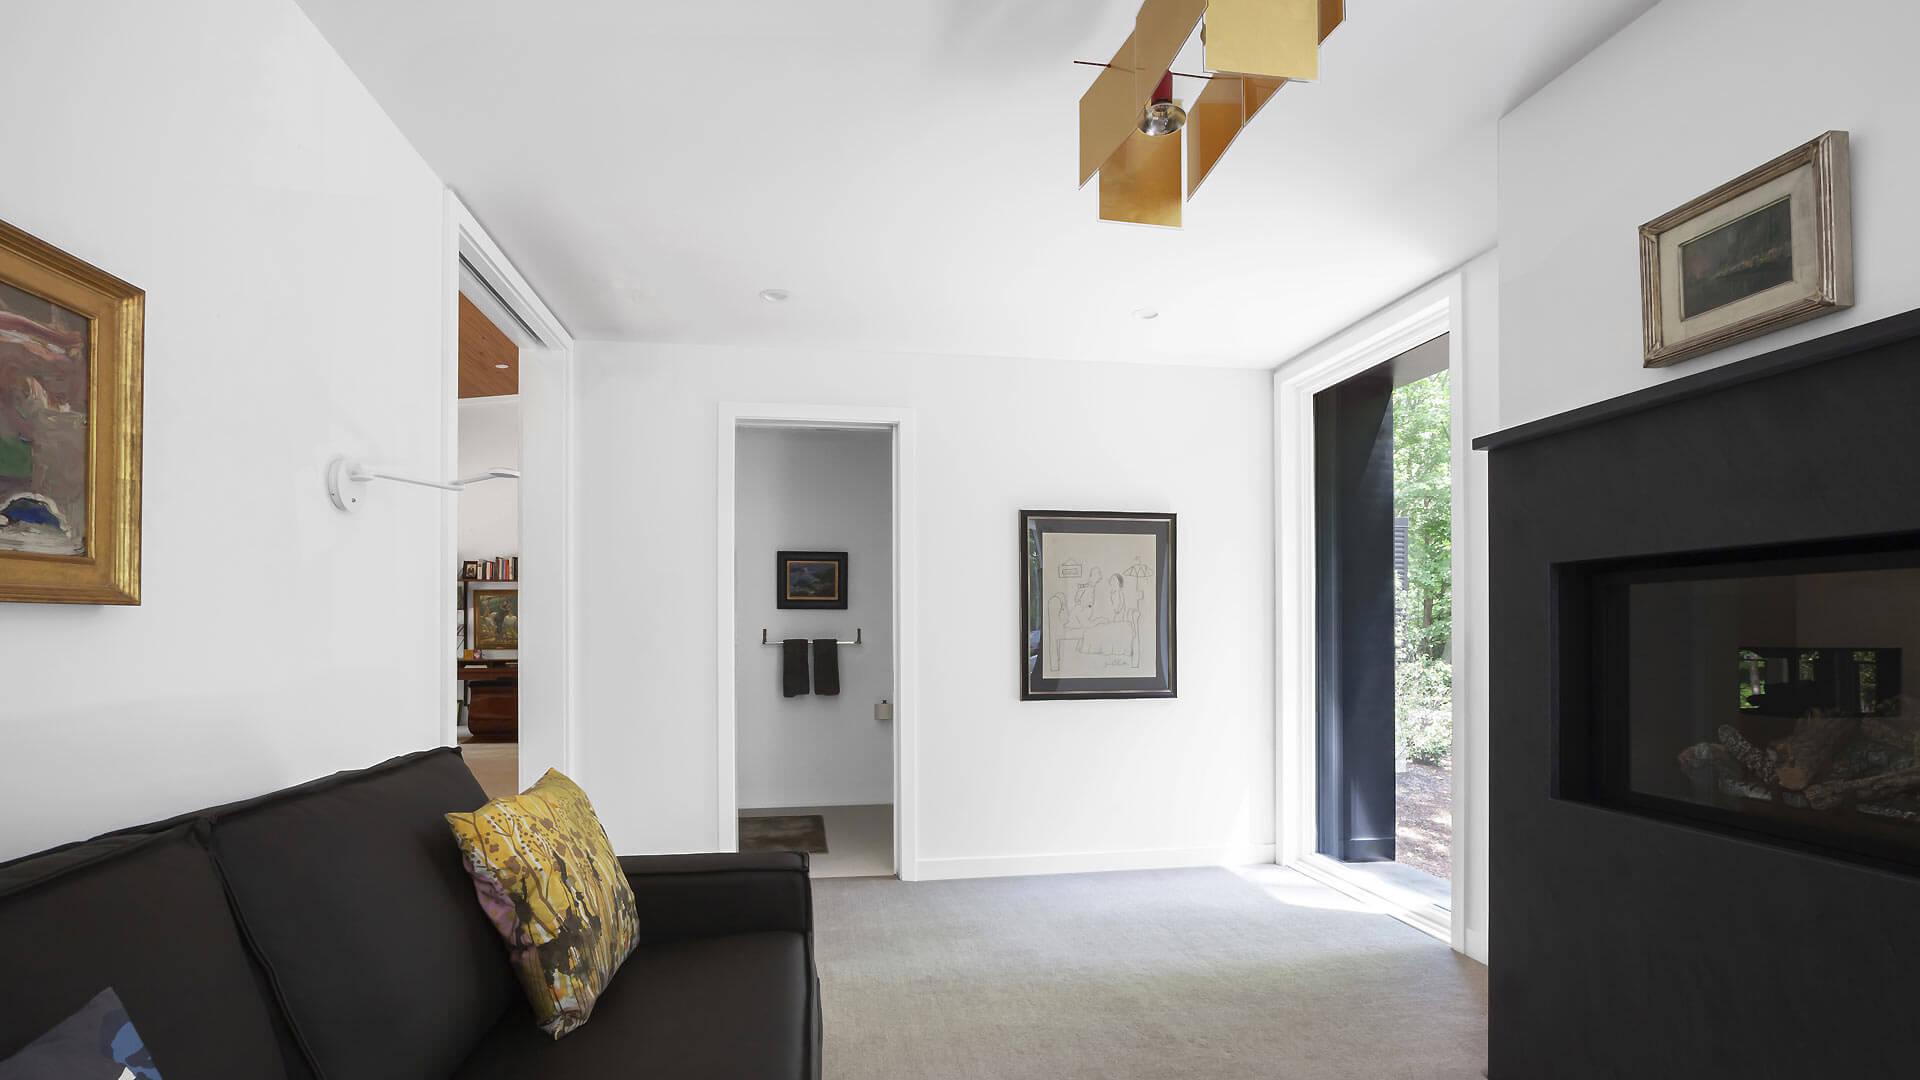 Guest Studio includes sleeper sofa, gas fireplace, and lighting by 24 Karat Blau® Pendant Lamp by Ingo Maurer - Bridge House - Fenneville, Michigan - Lake Michigan